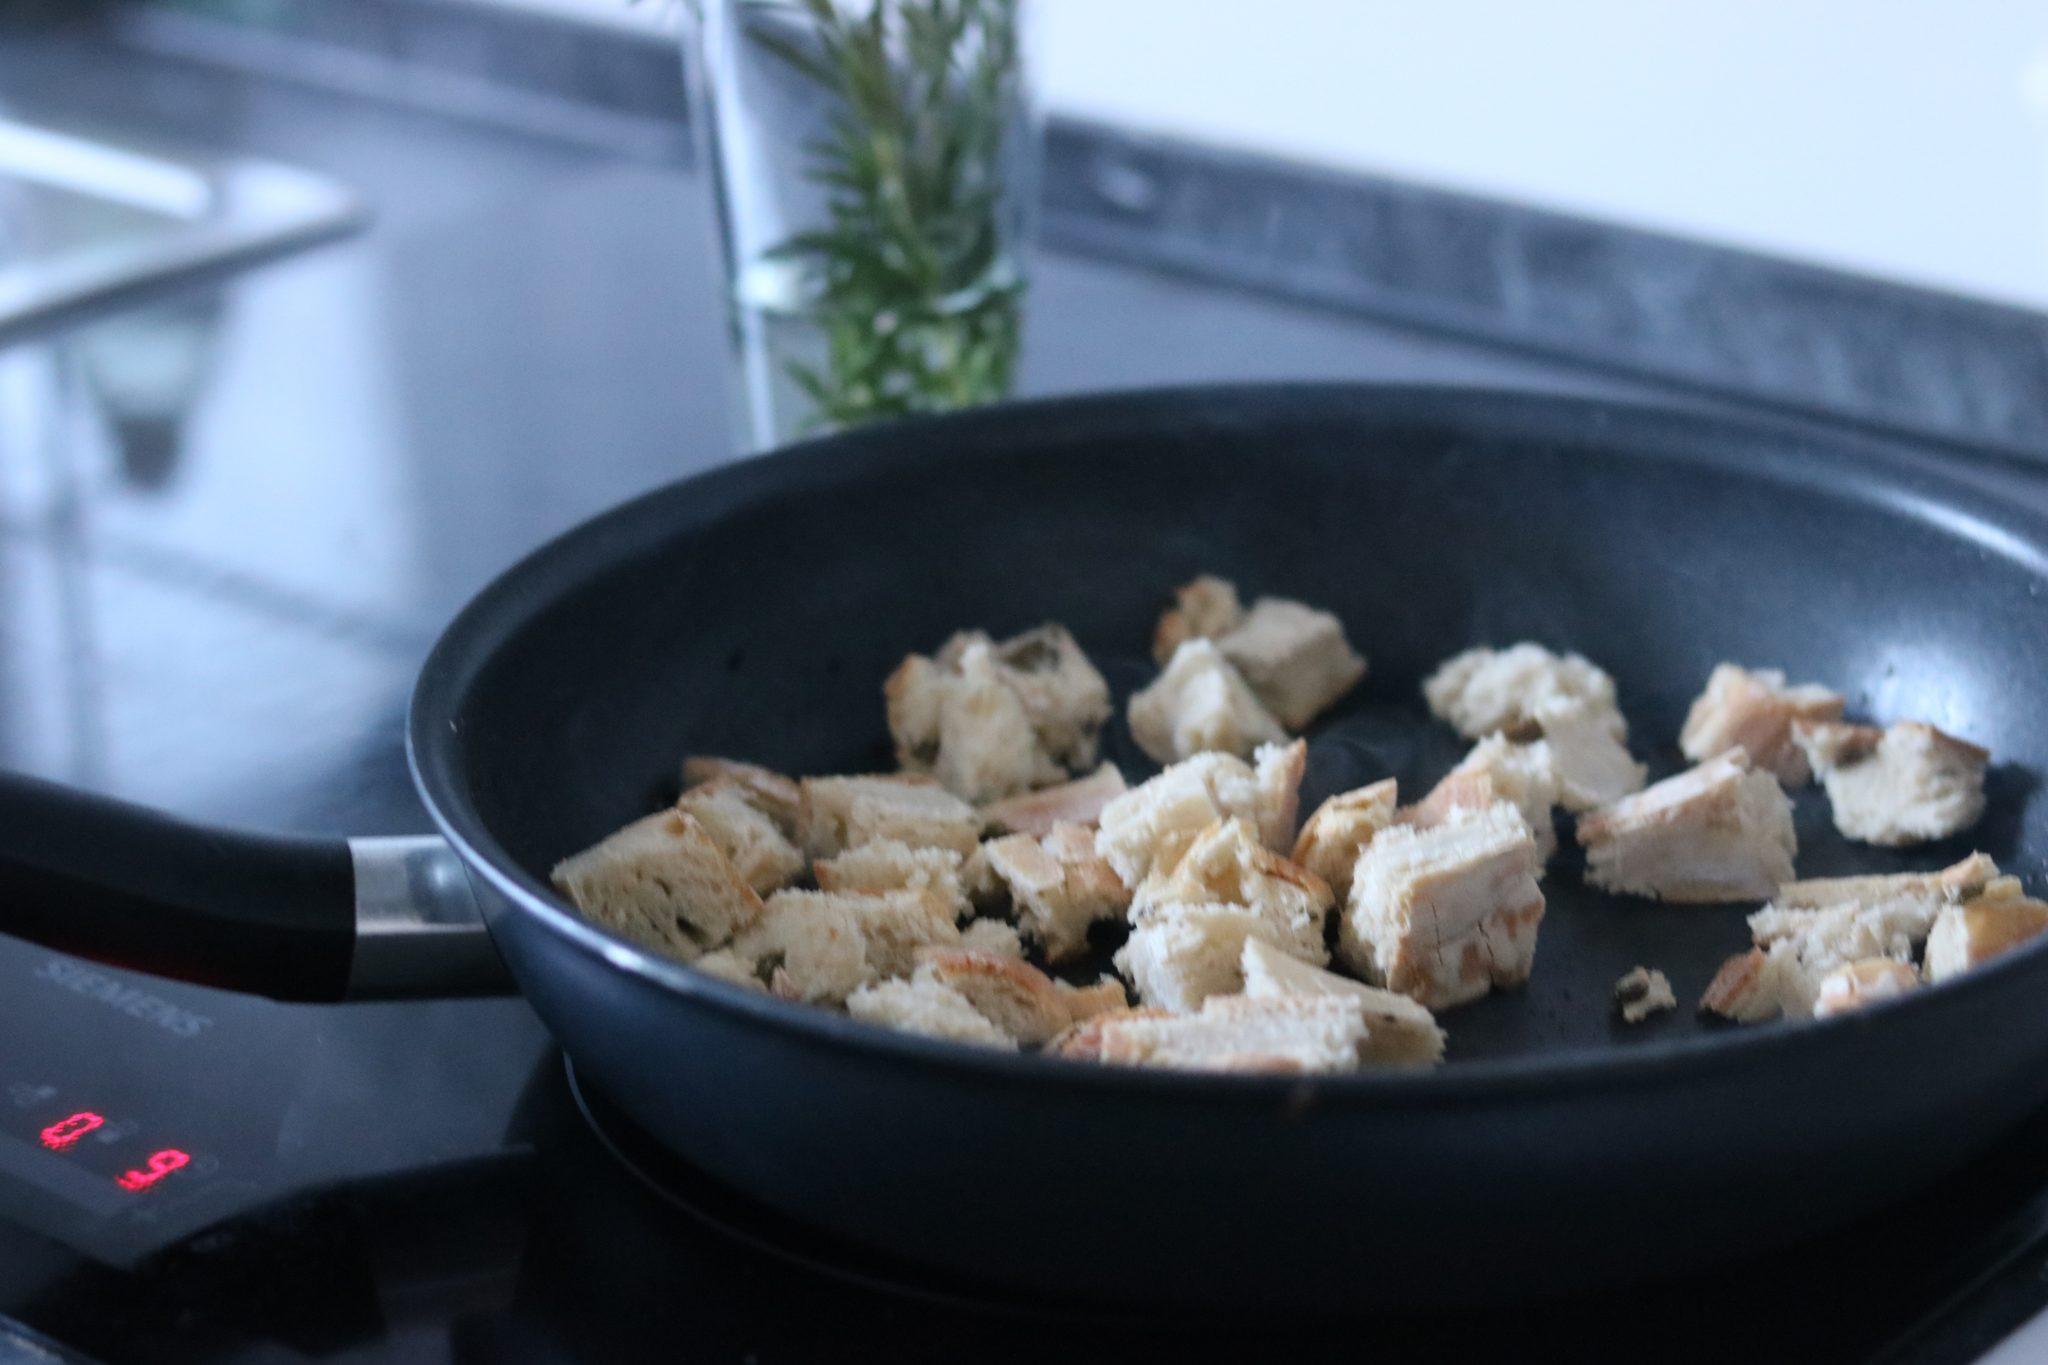 natürlich-lecker-knorr-ciabatta-anbraten-brot-salat